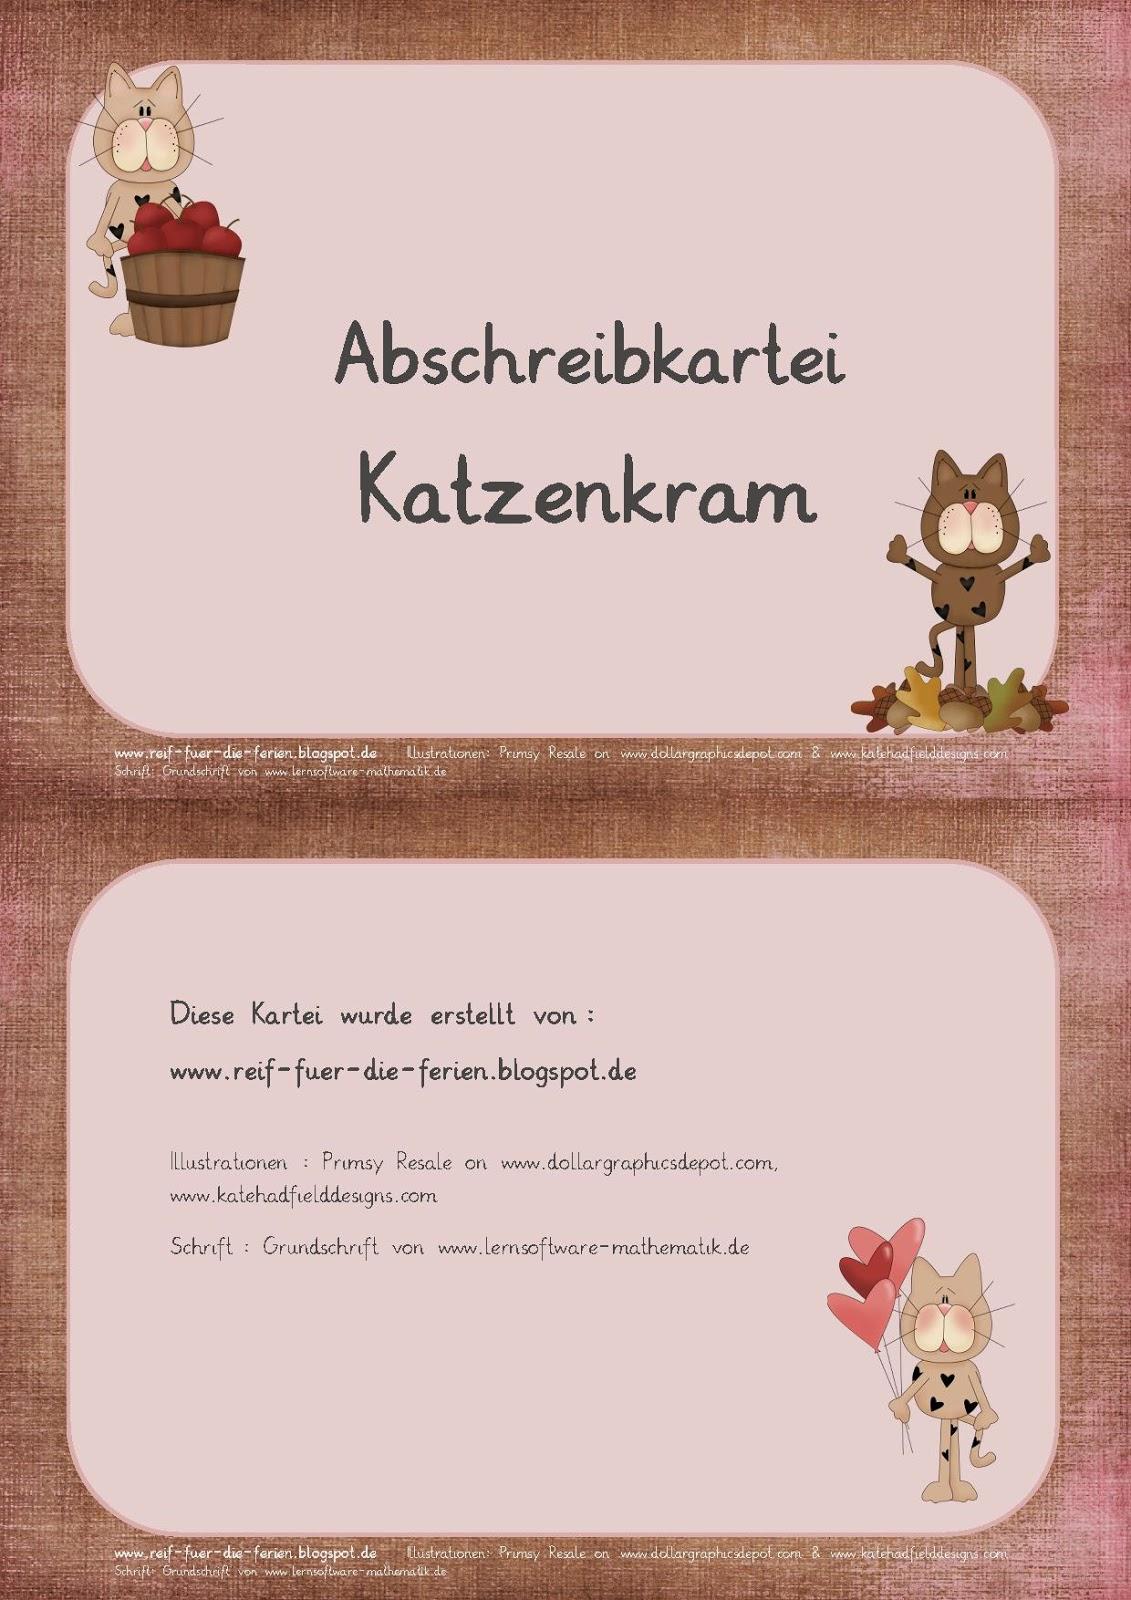 Abschreibkartei GS - Katzenkram